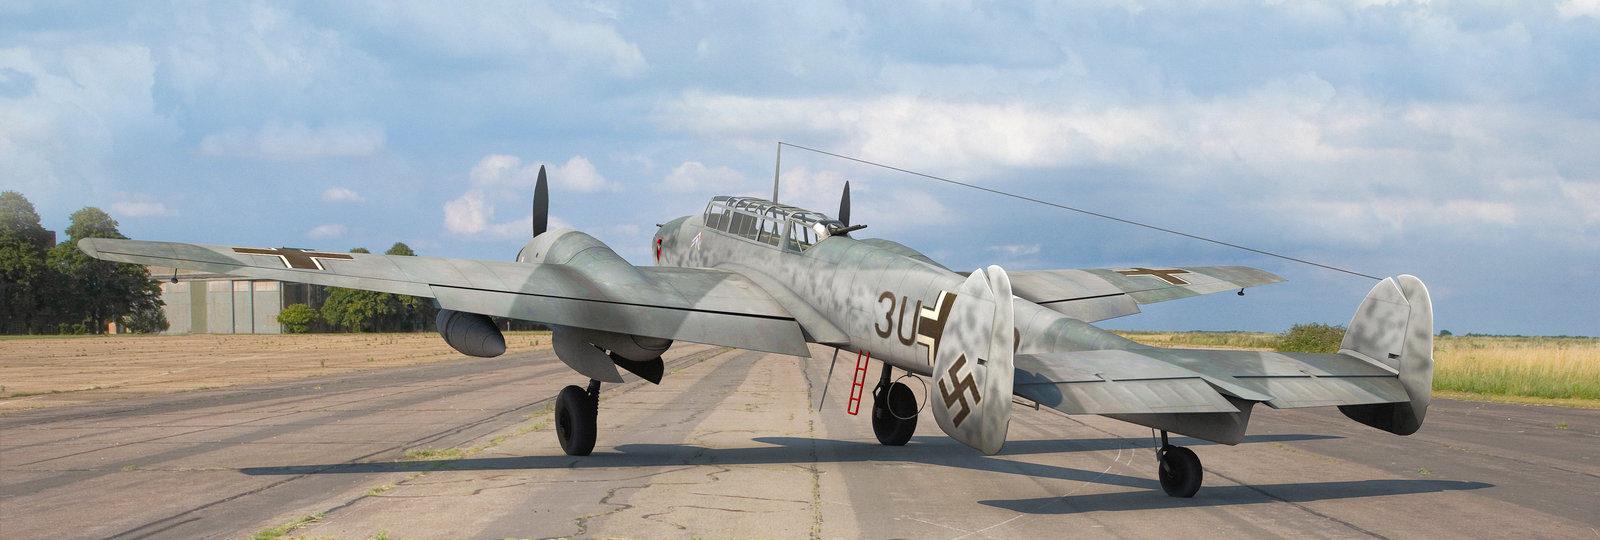 Karidis Antonis. Истребитель Bf-110.